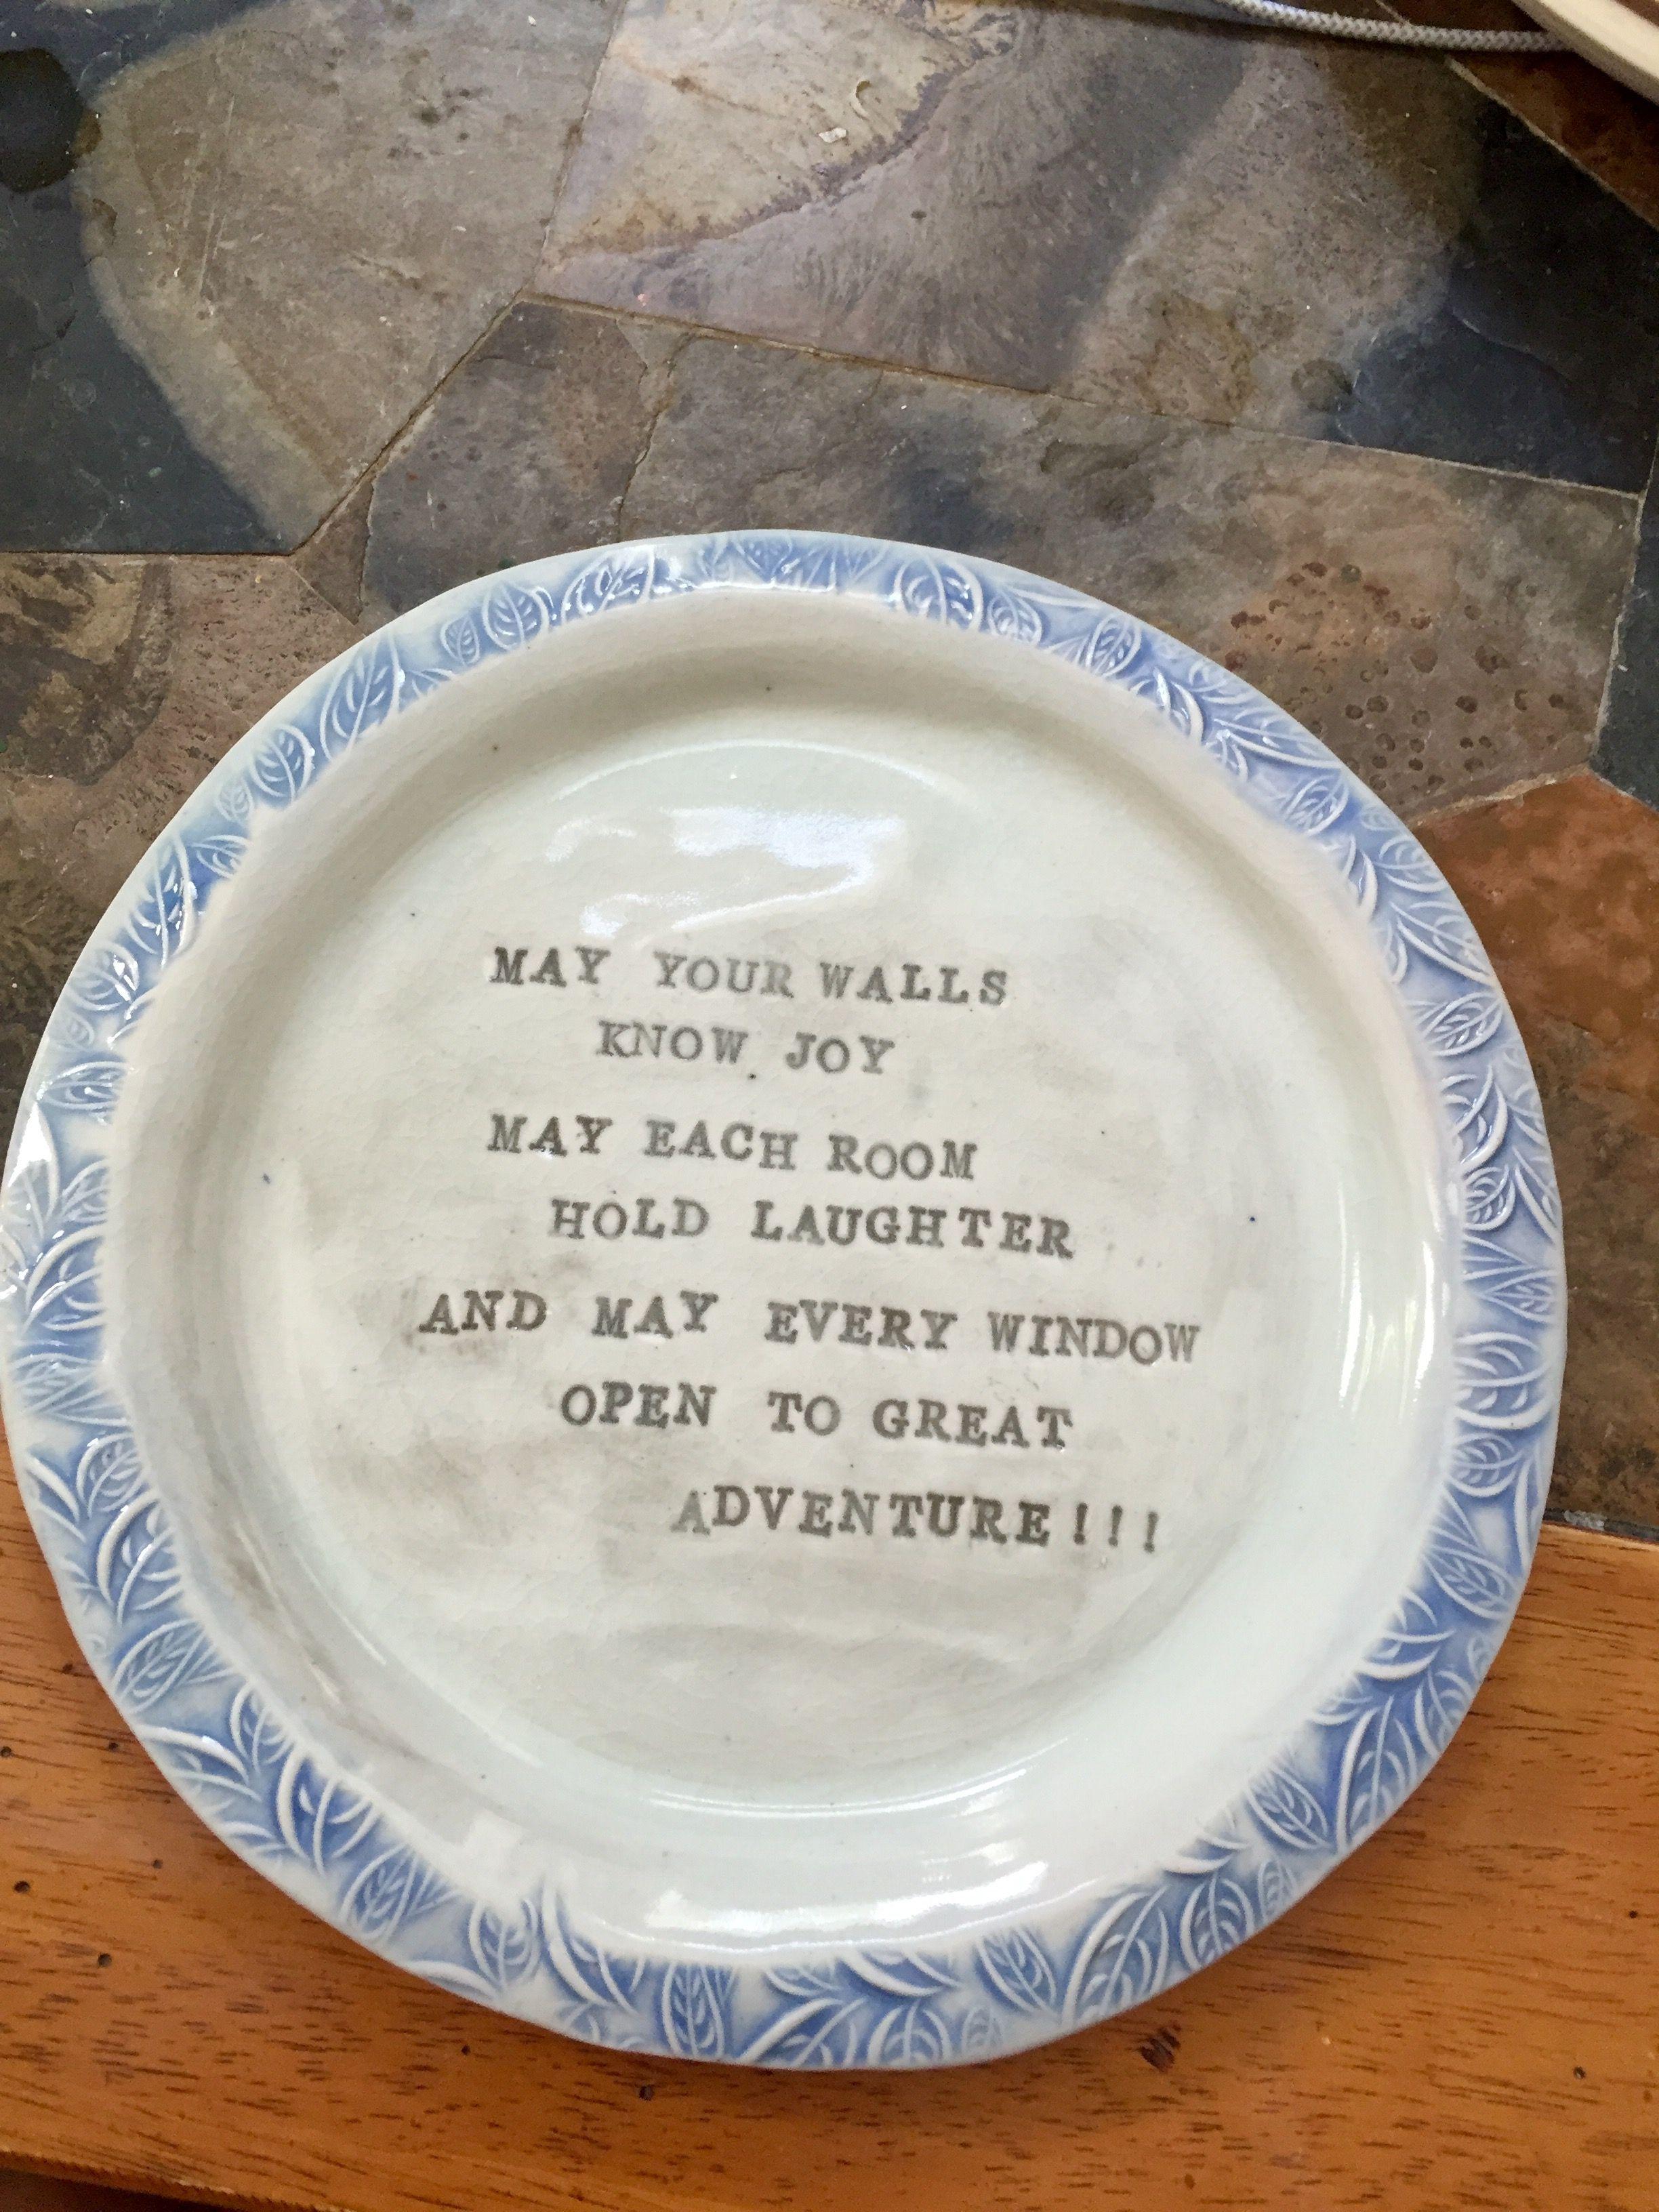 Great ceramic plate